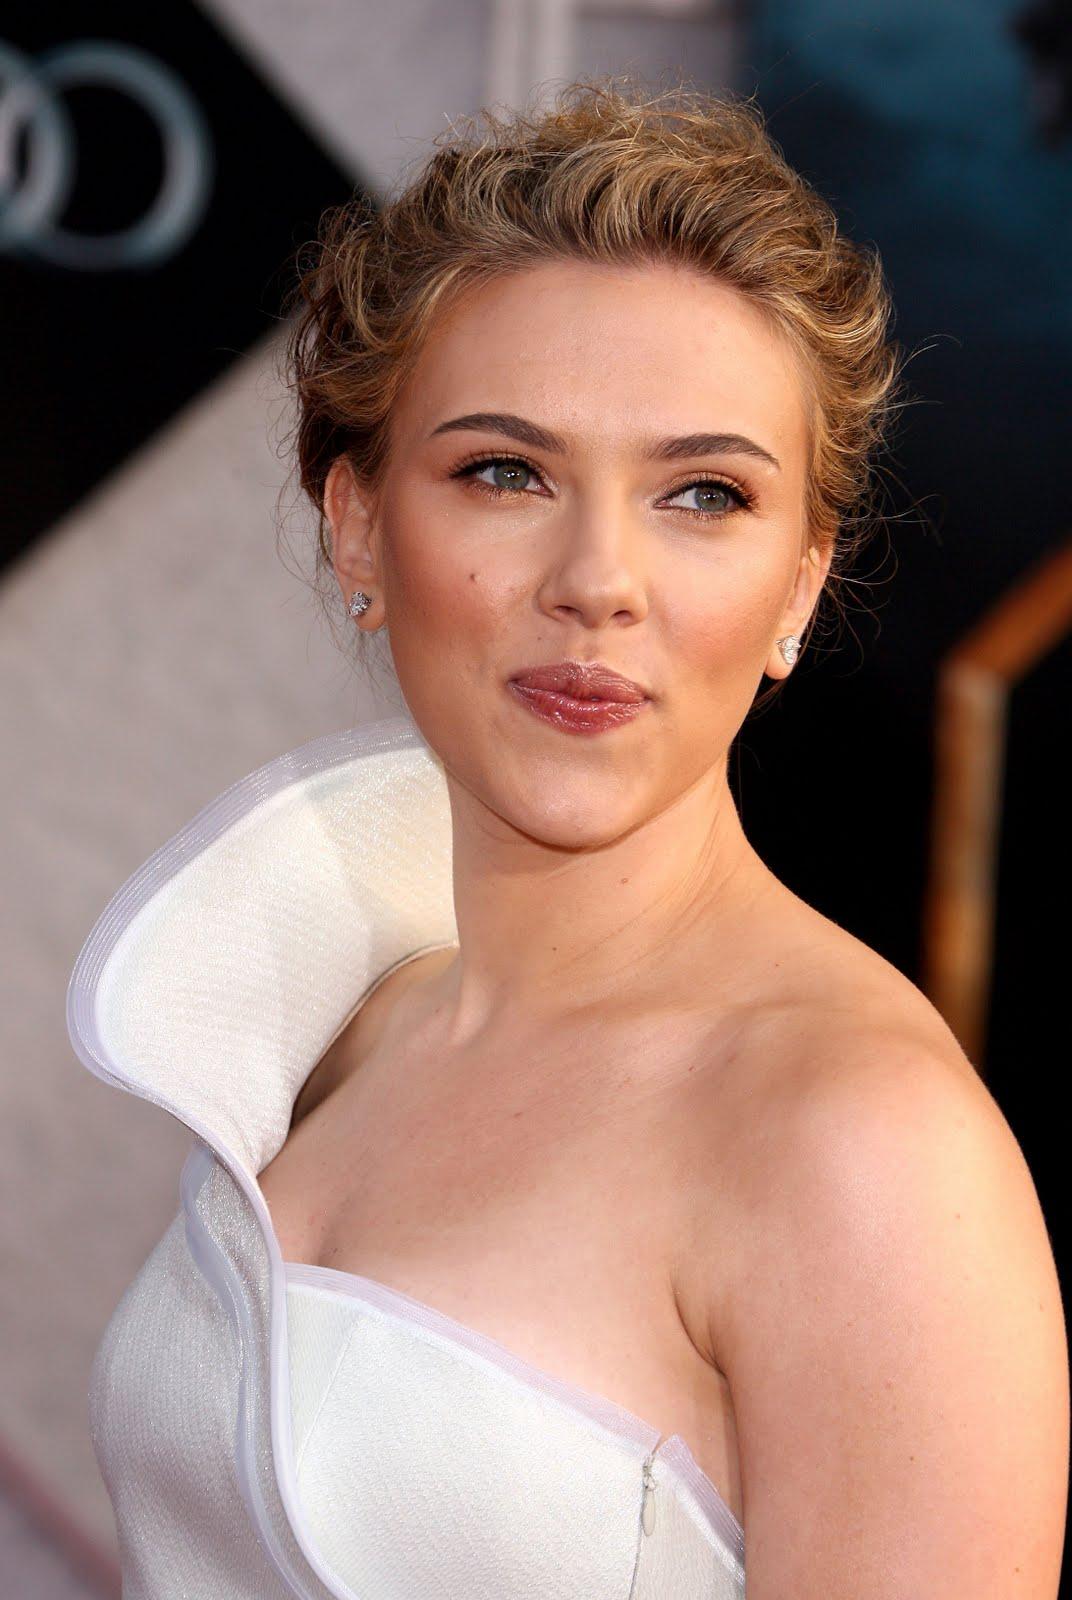 Scarlett johansson special pictures 6 film actresses - Scarlett johansson blogspot ...